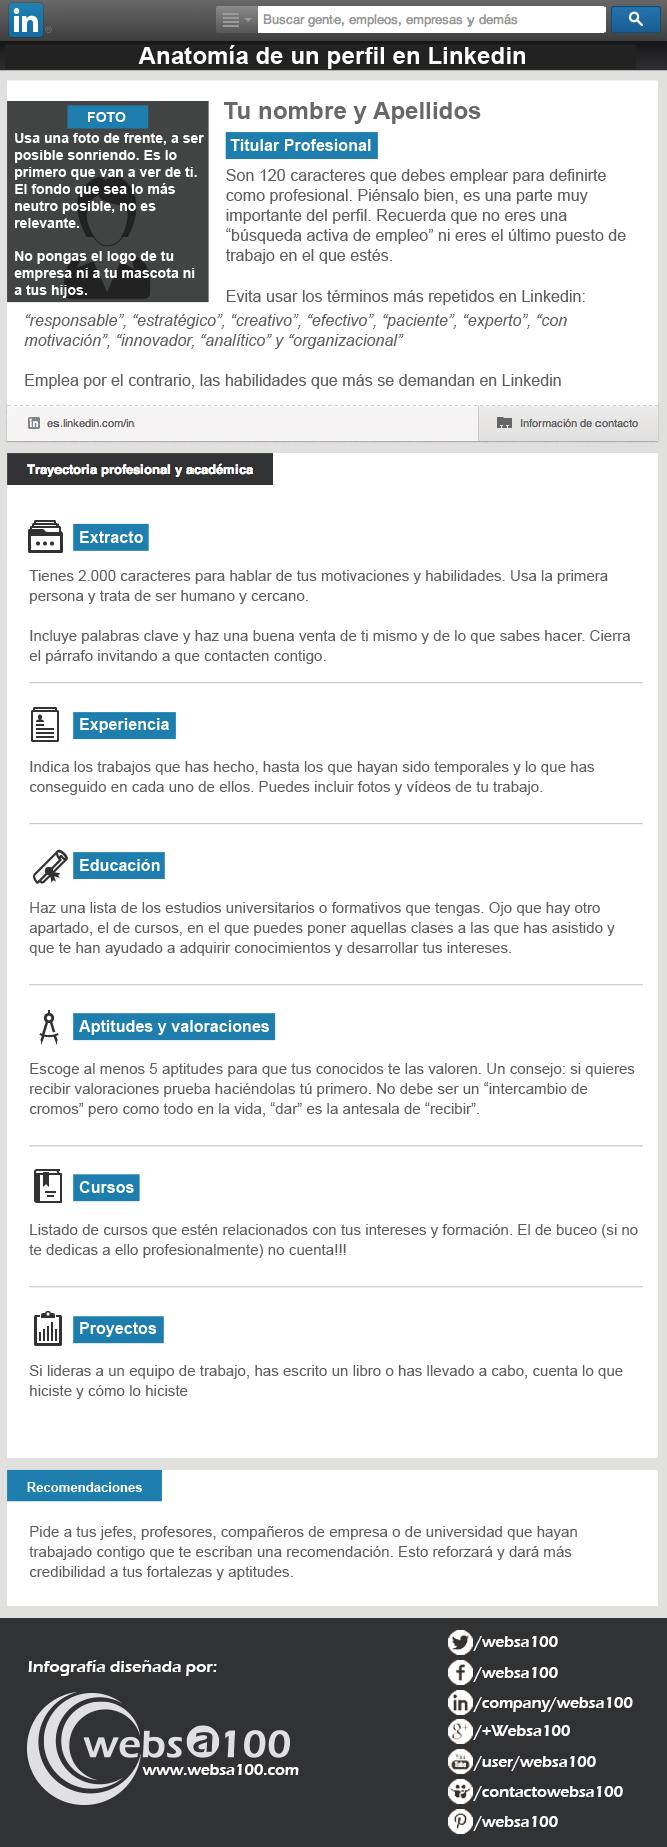 infografia_anatomia-de-un-perfil-en-linkedin